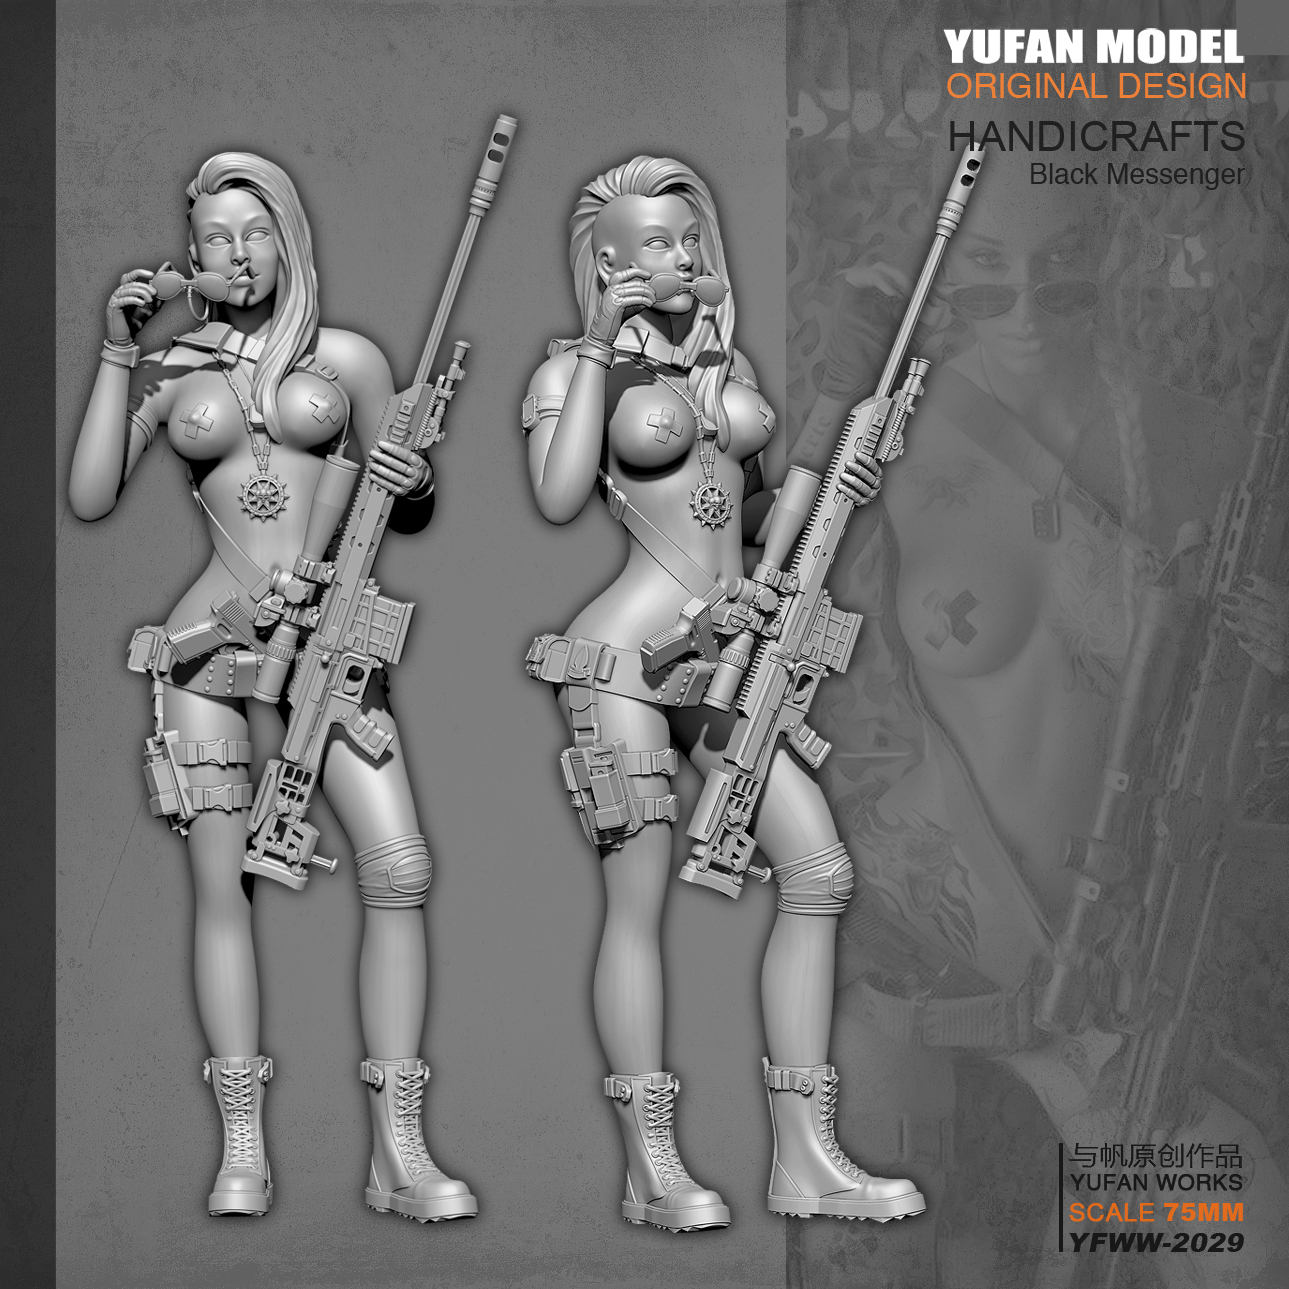 YUFAN Model 1/24 Resin Kits Sexy Female Gunman Resin Soldier  Self-assembled (75mm) YFWW-2029